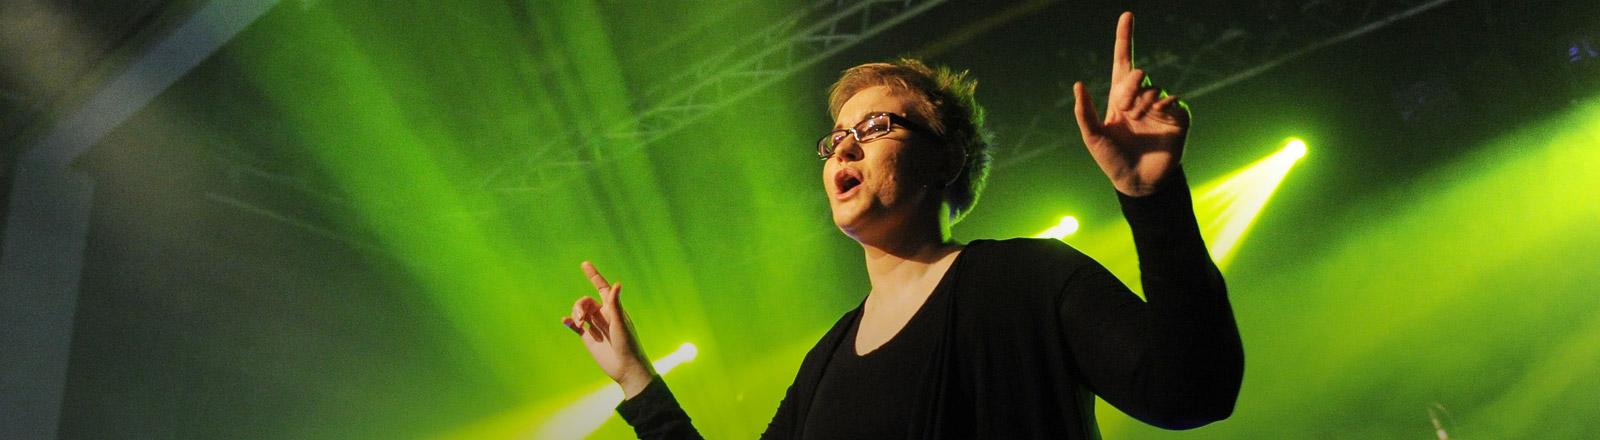 Laura Schwengber